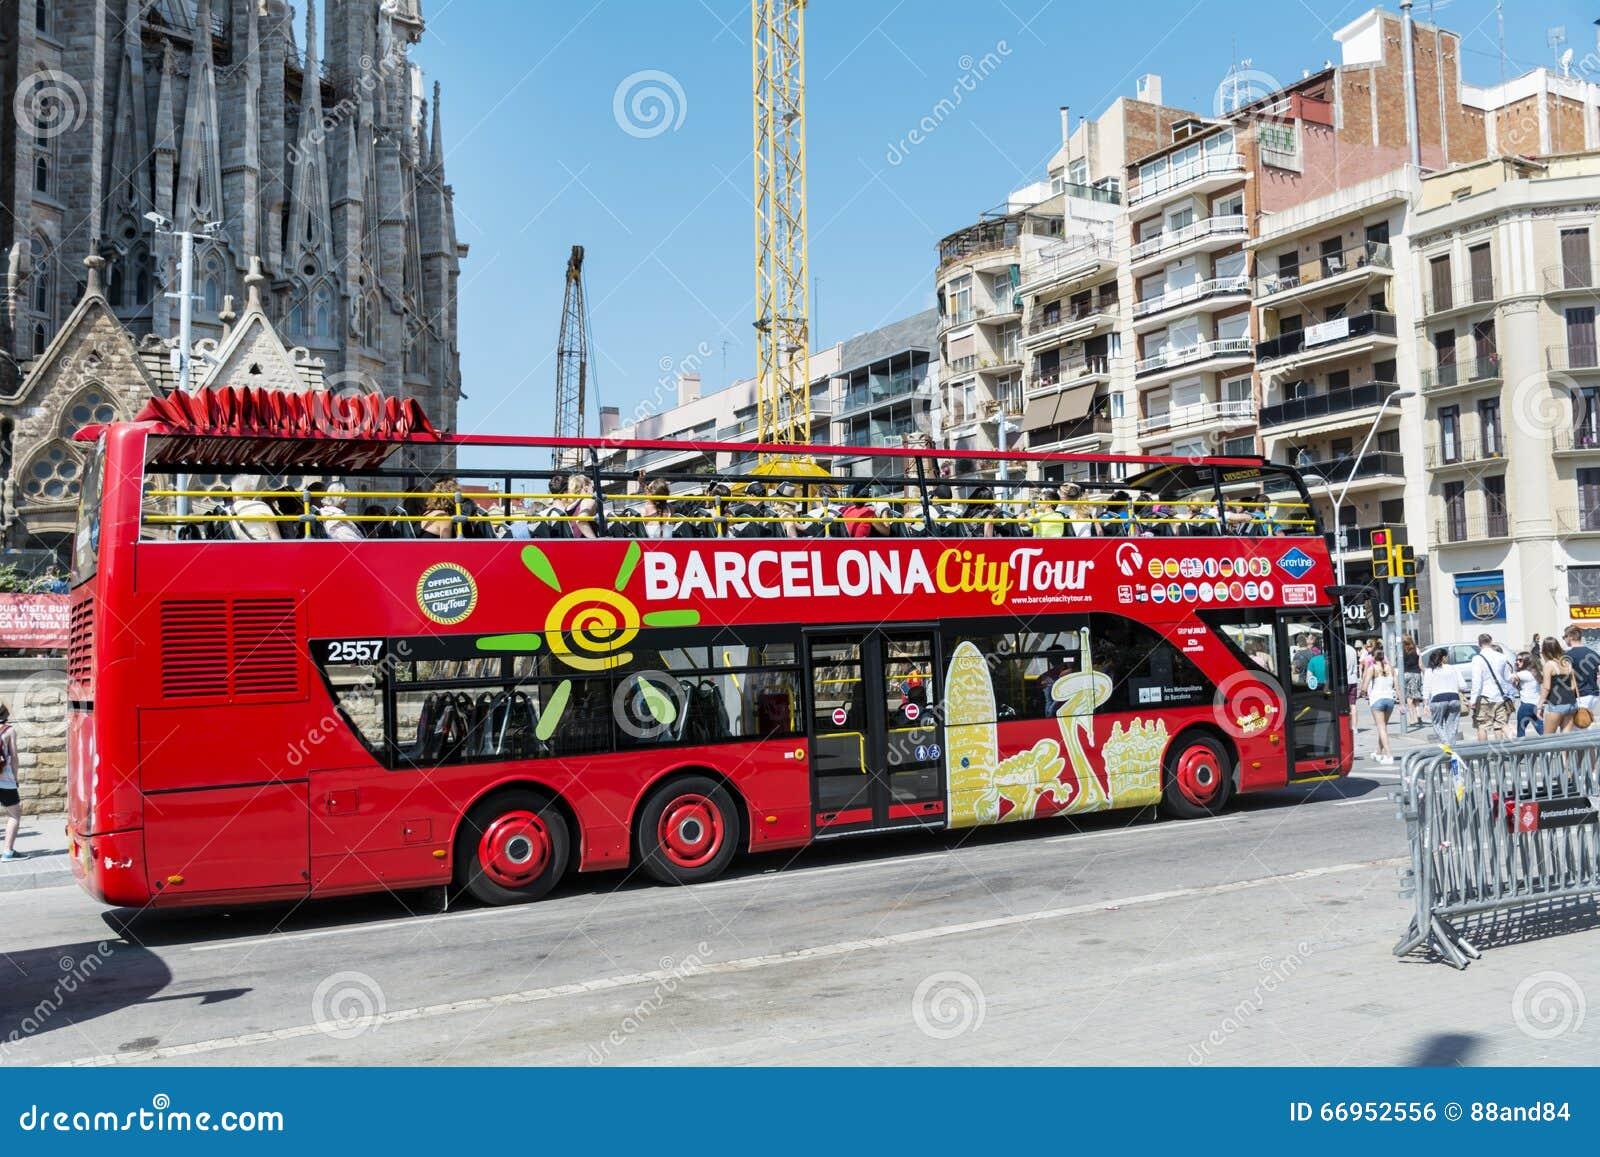 Barcelona bus tours coupons